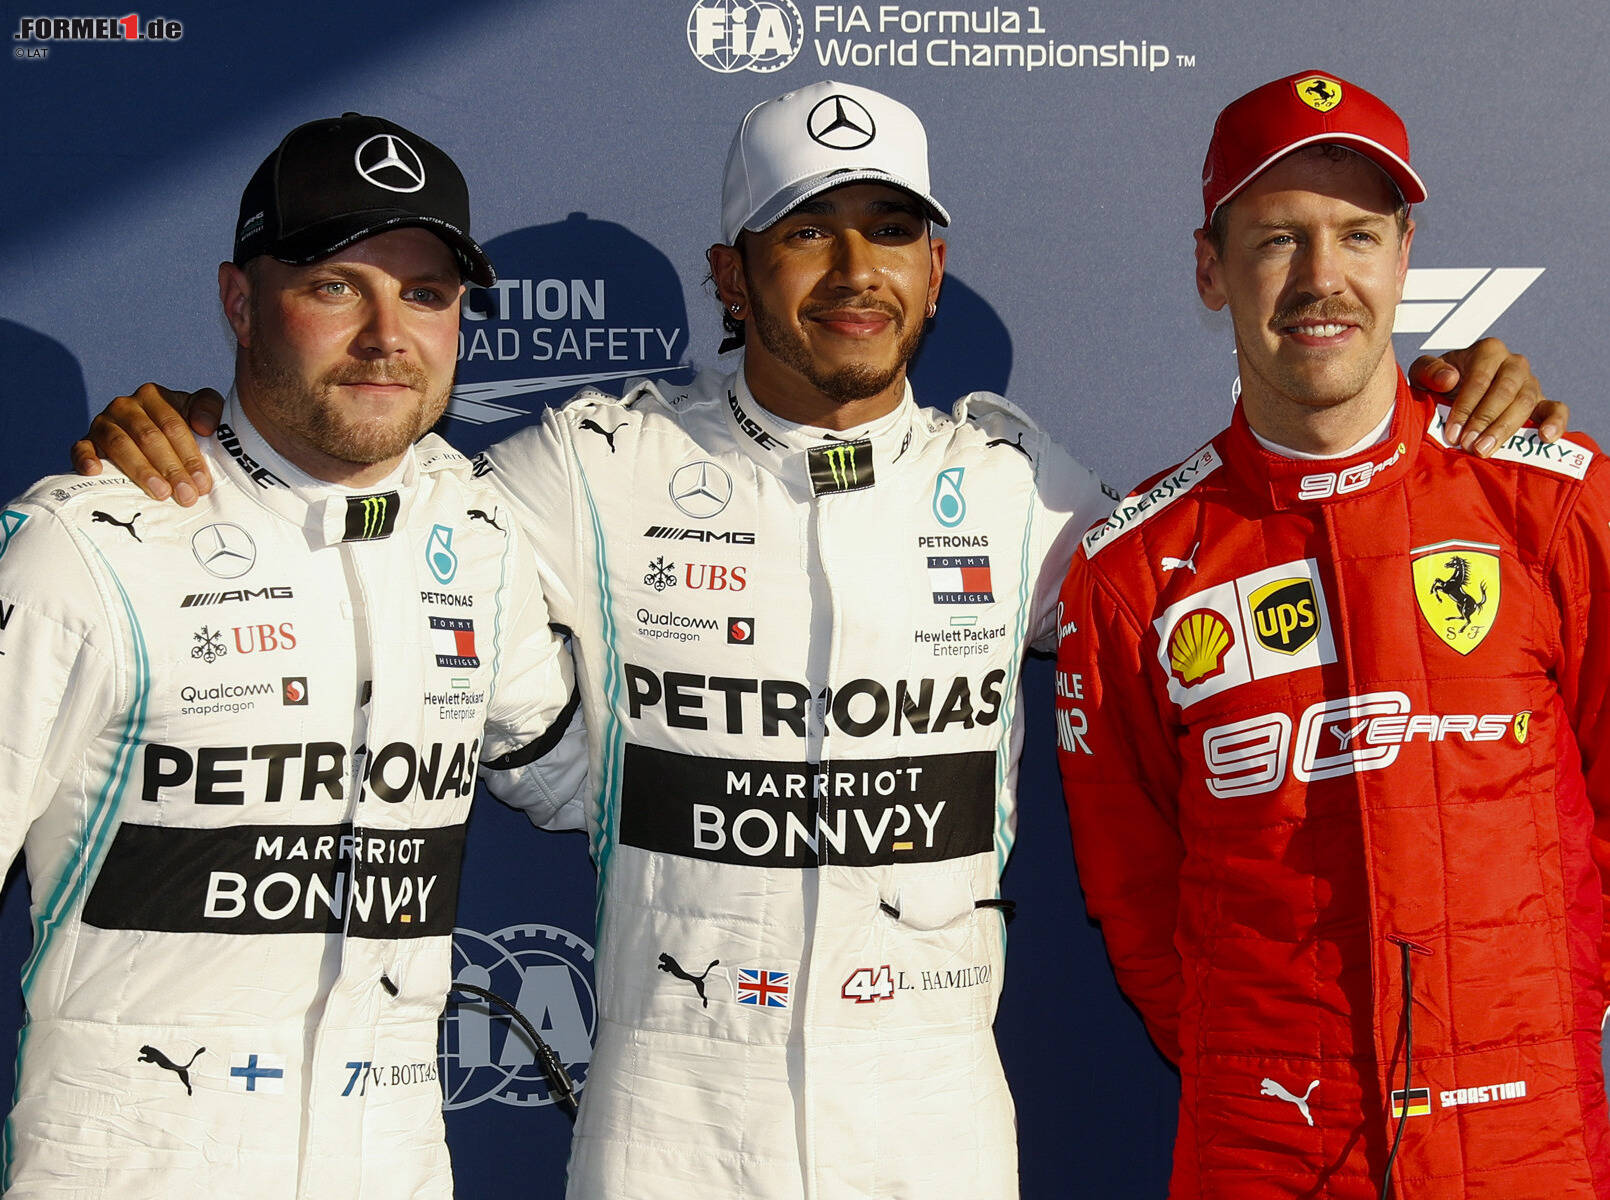 f1 qualifying - photo #33